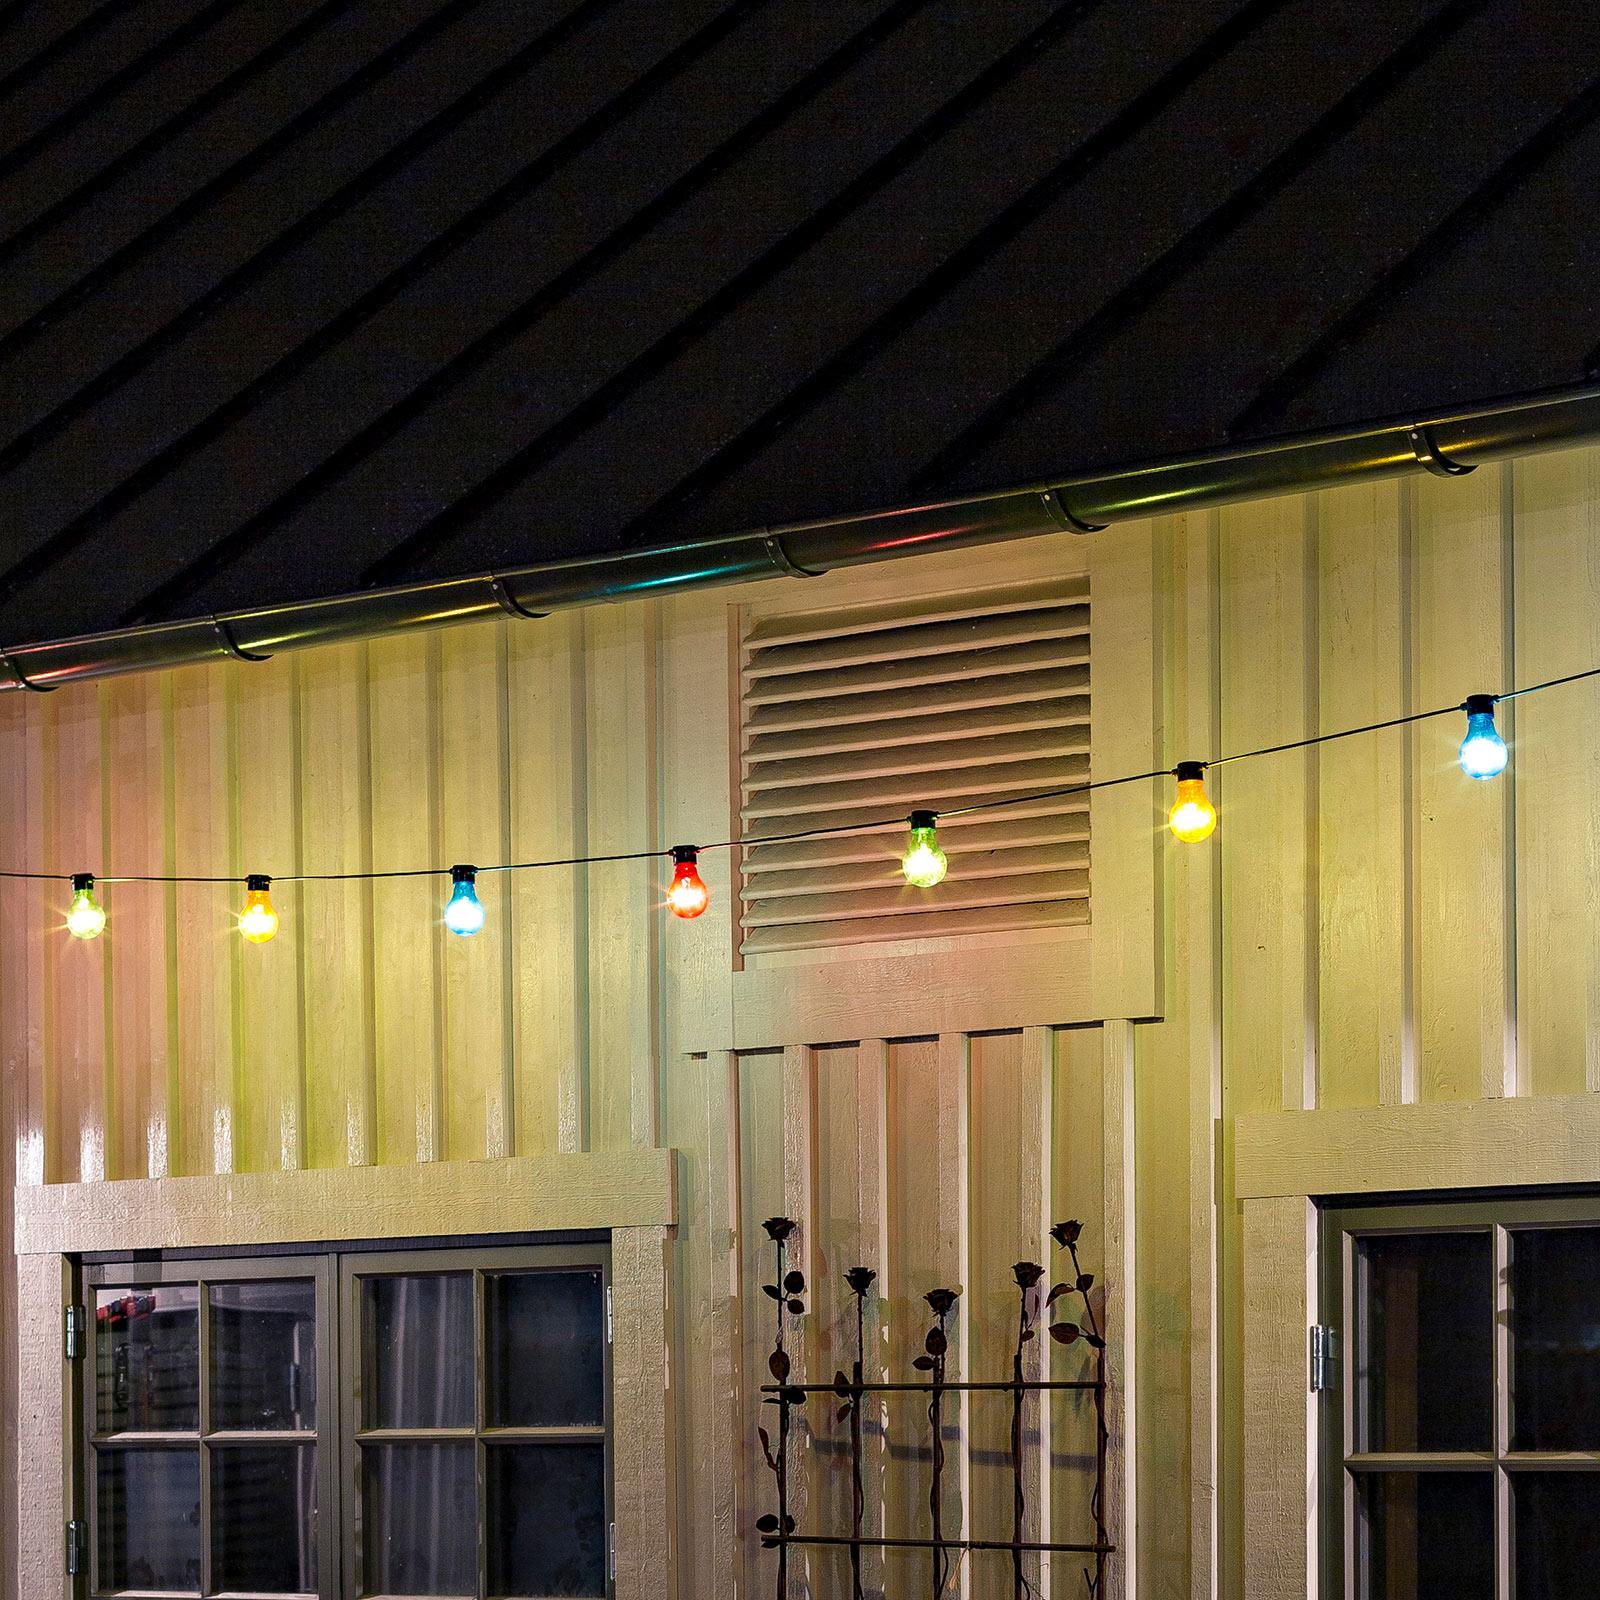 Ljusslinga Biergarten 20 färgade LED-lampor